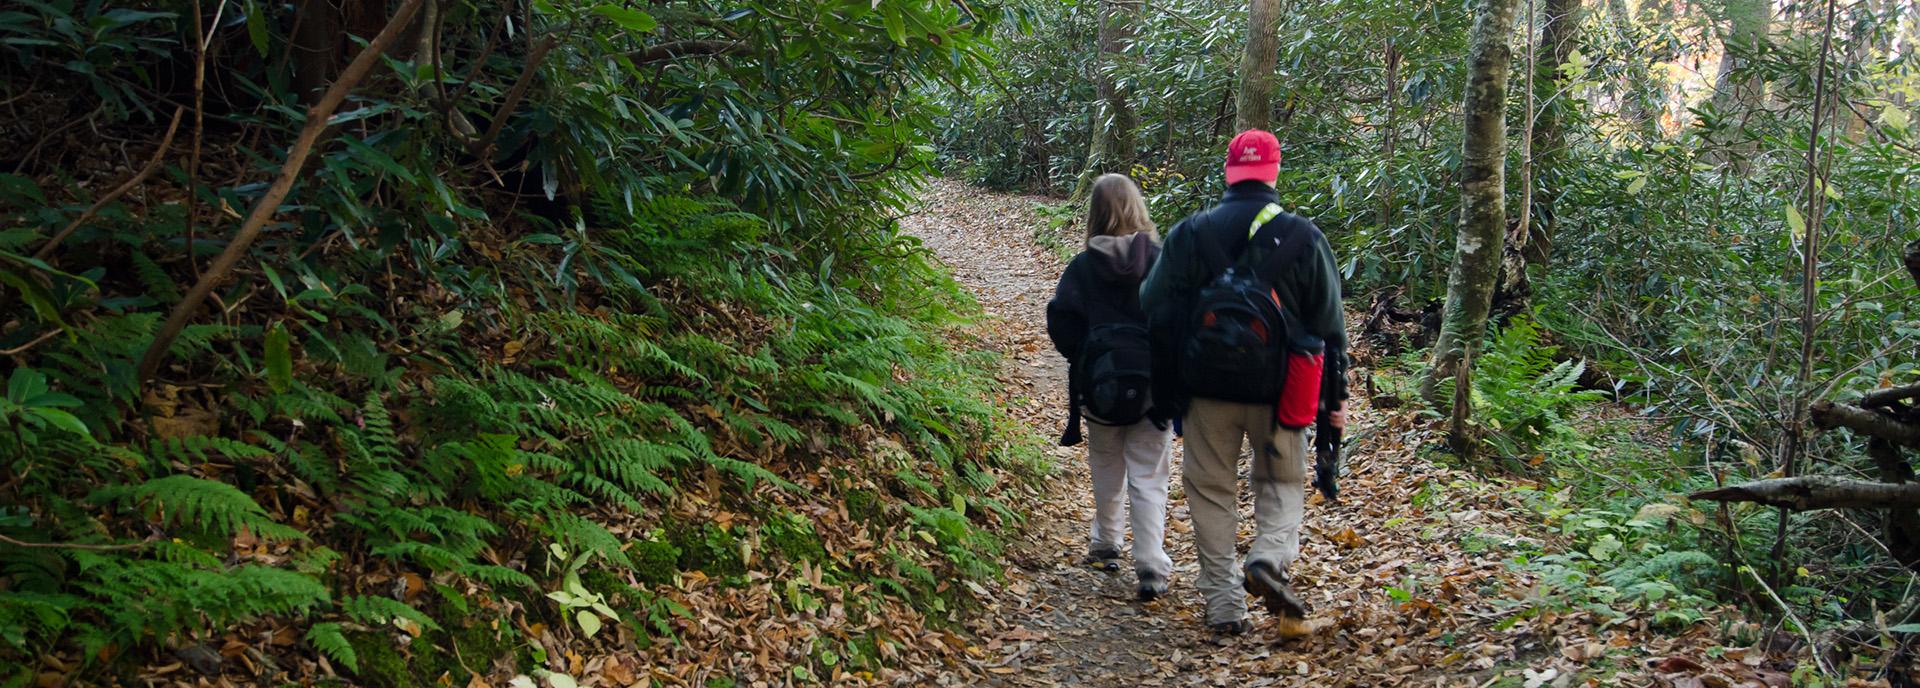 about walking down trail